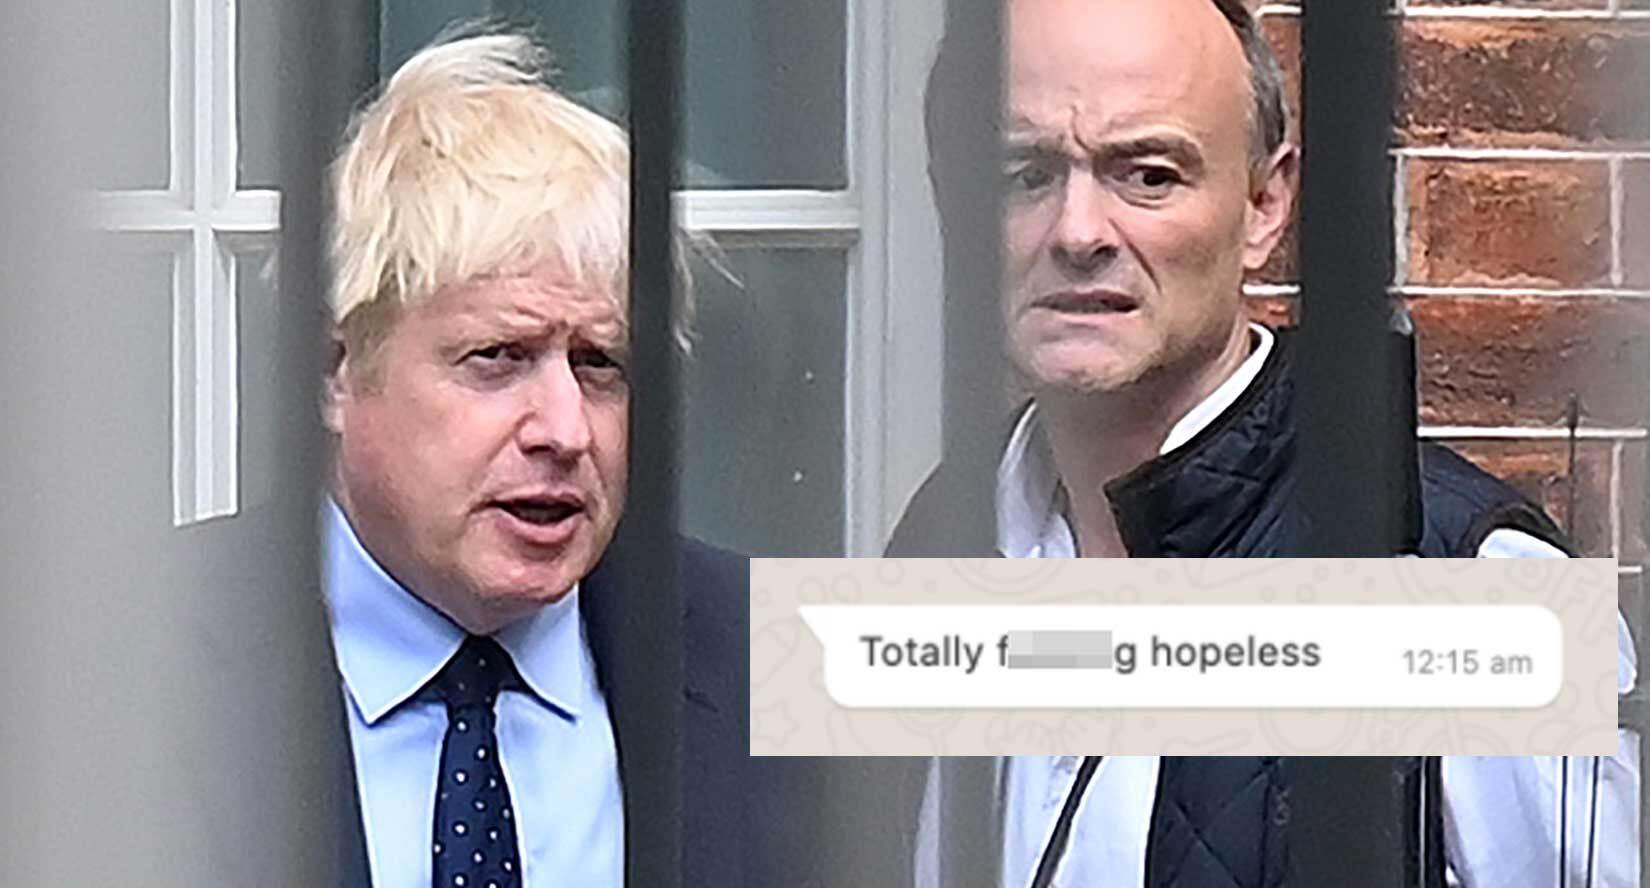 'Totally f***ing hopeless': Bombshell Boris Johnson WhatsApp about Matt Hancock leaked by Dominic Cummings